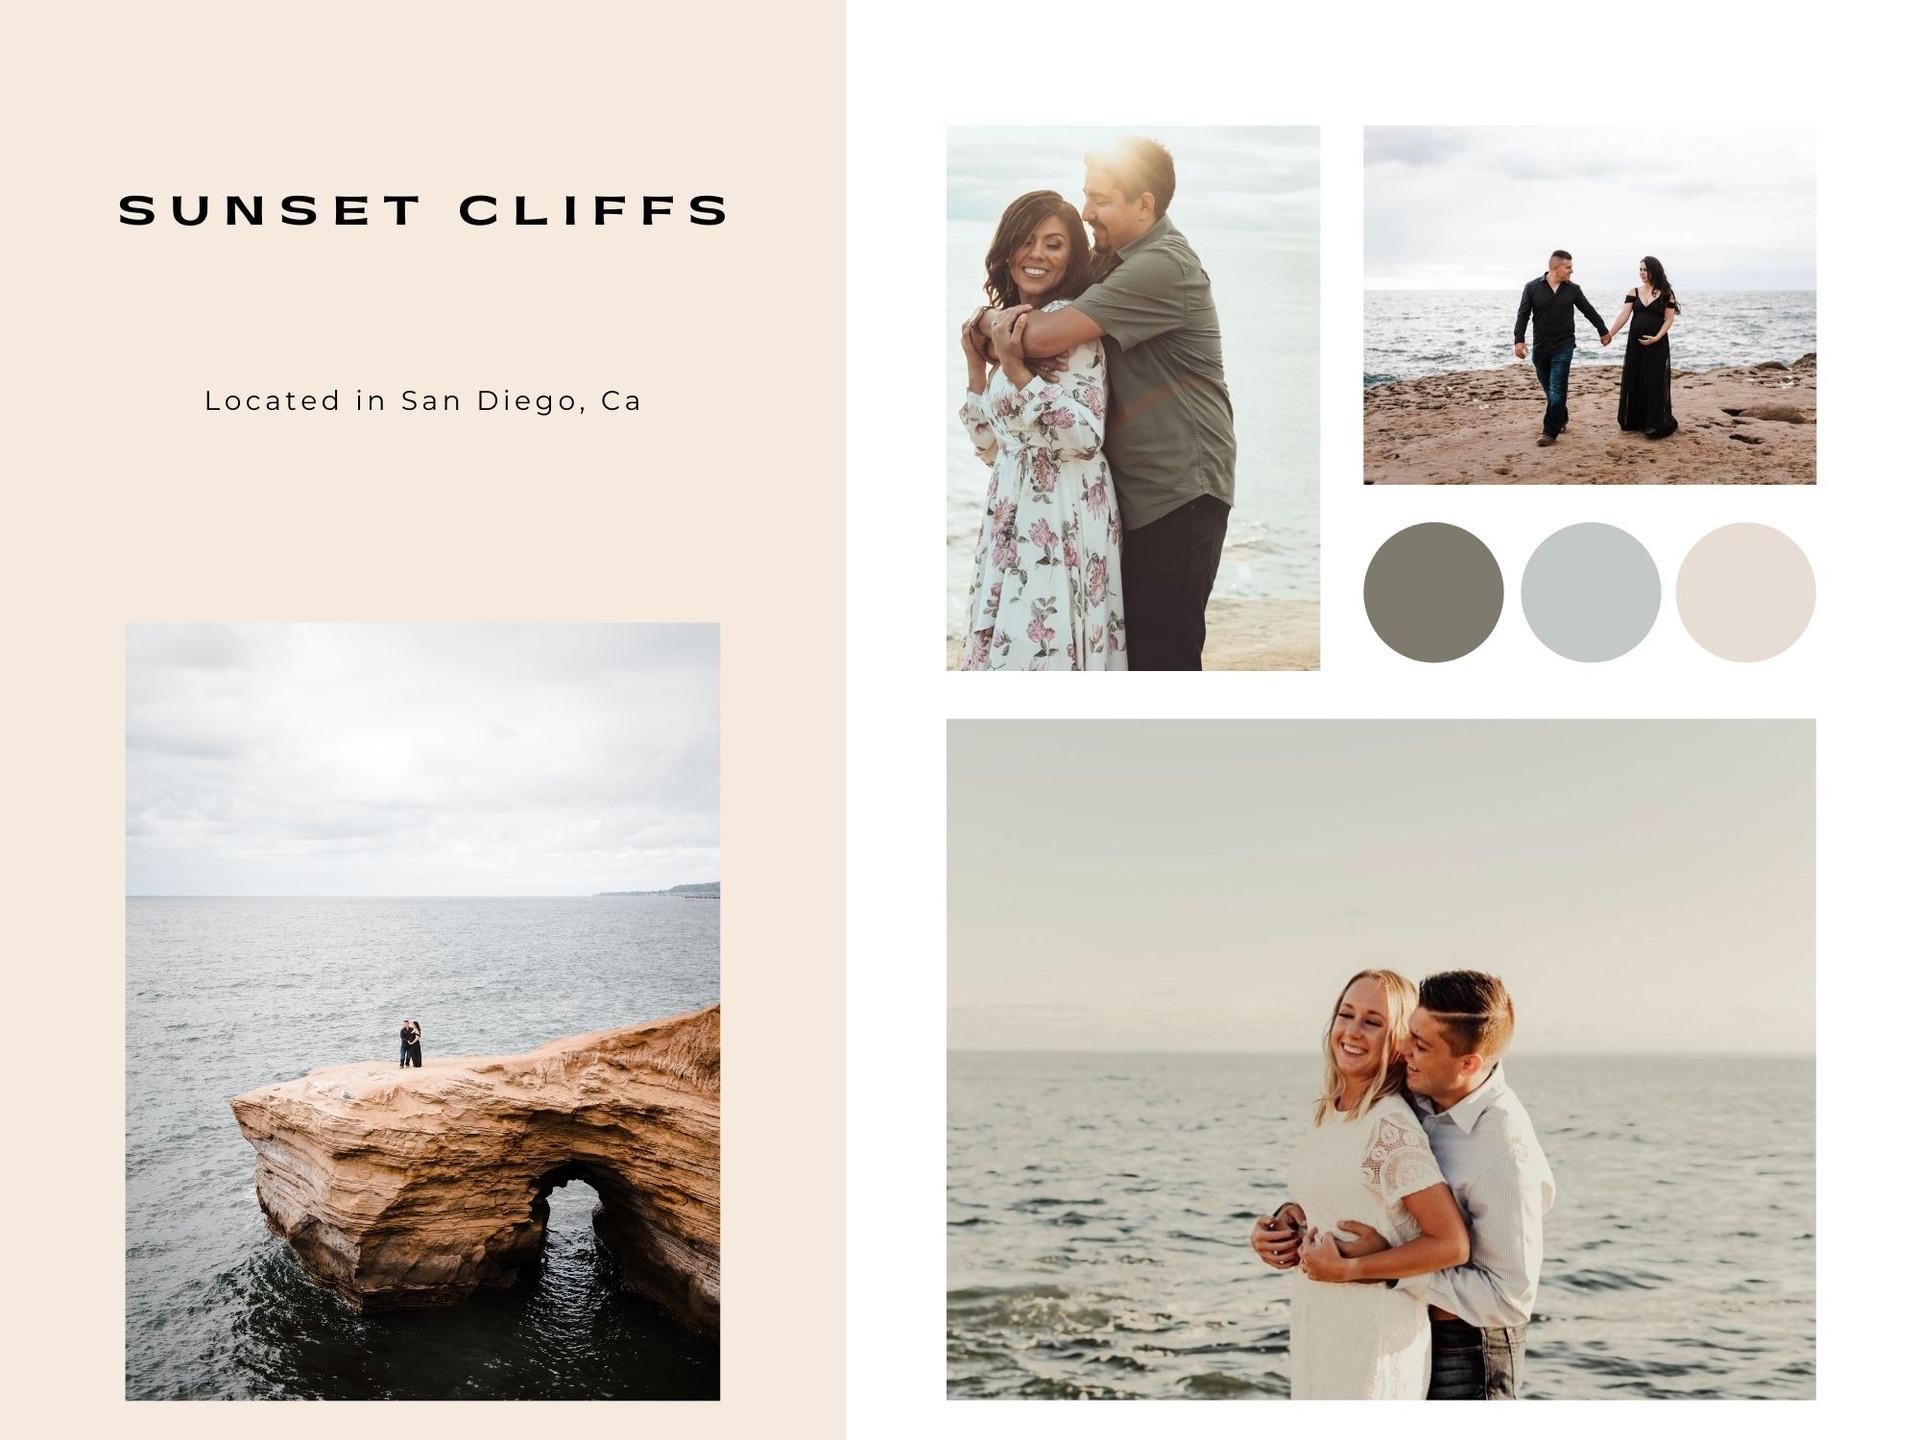 sunset cliffs california san diego photographer beach photoshoot couples maternity